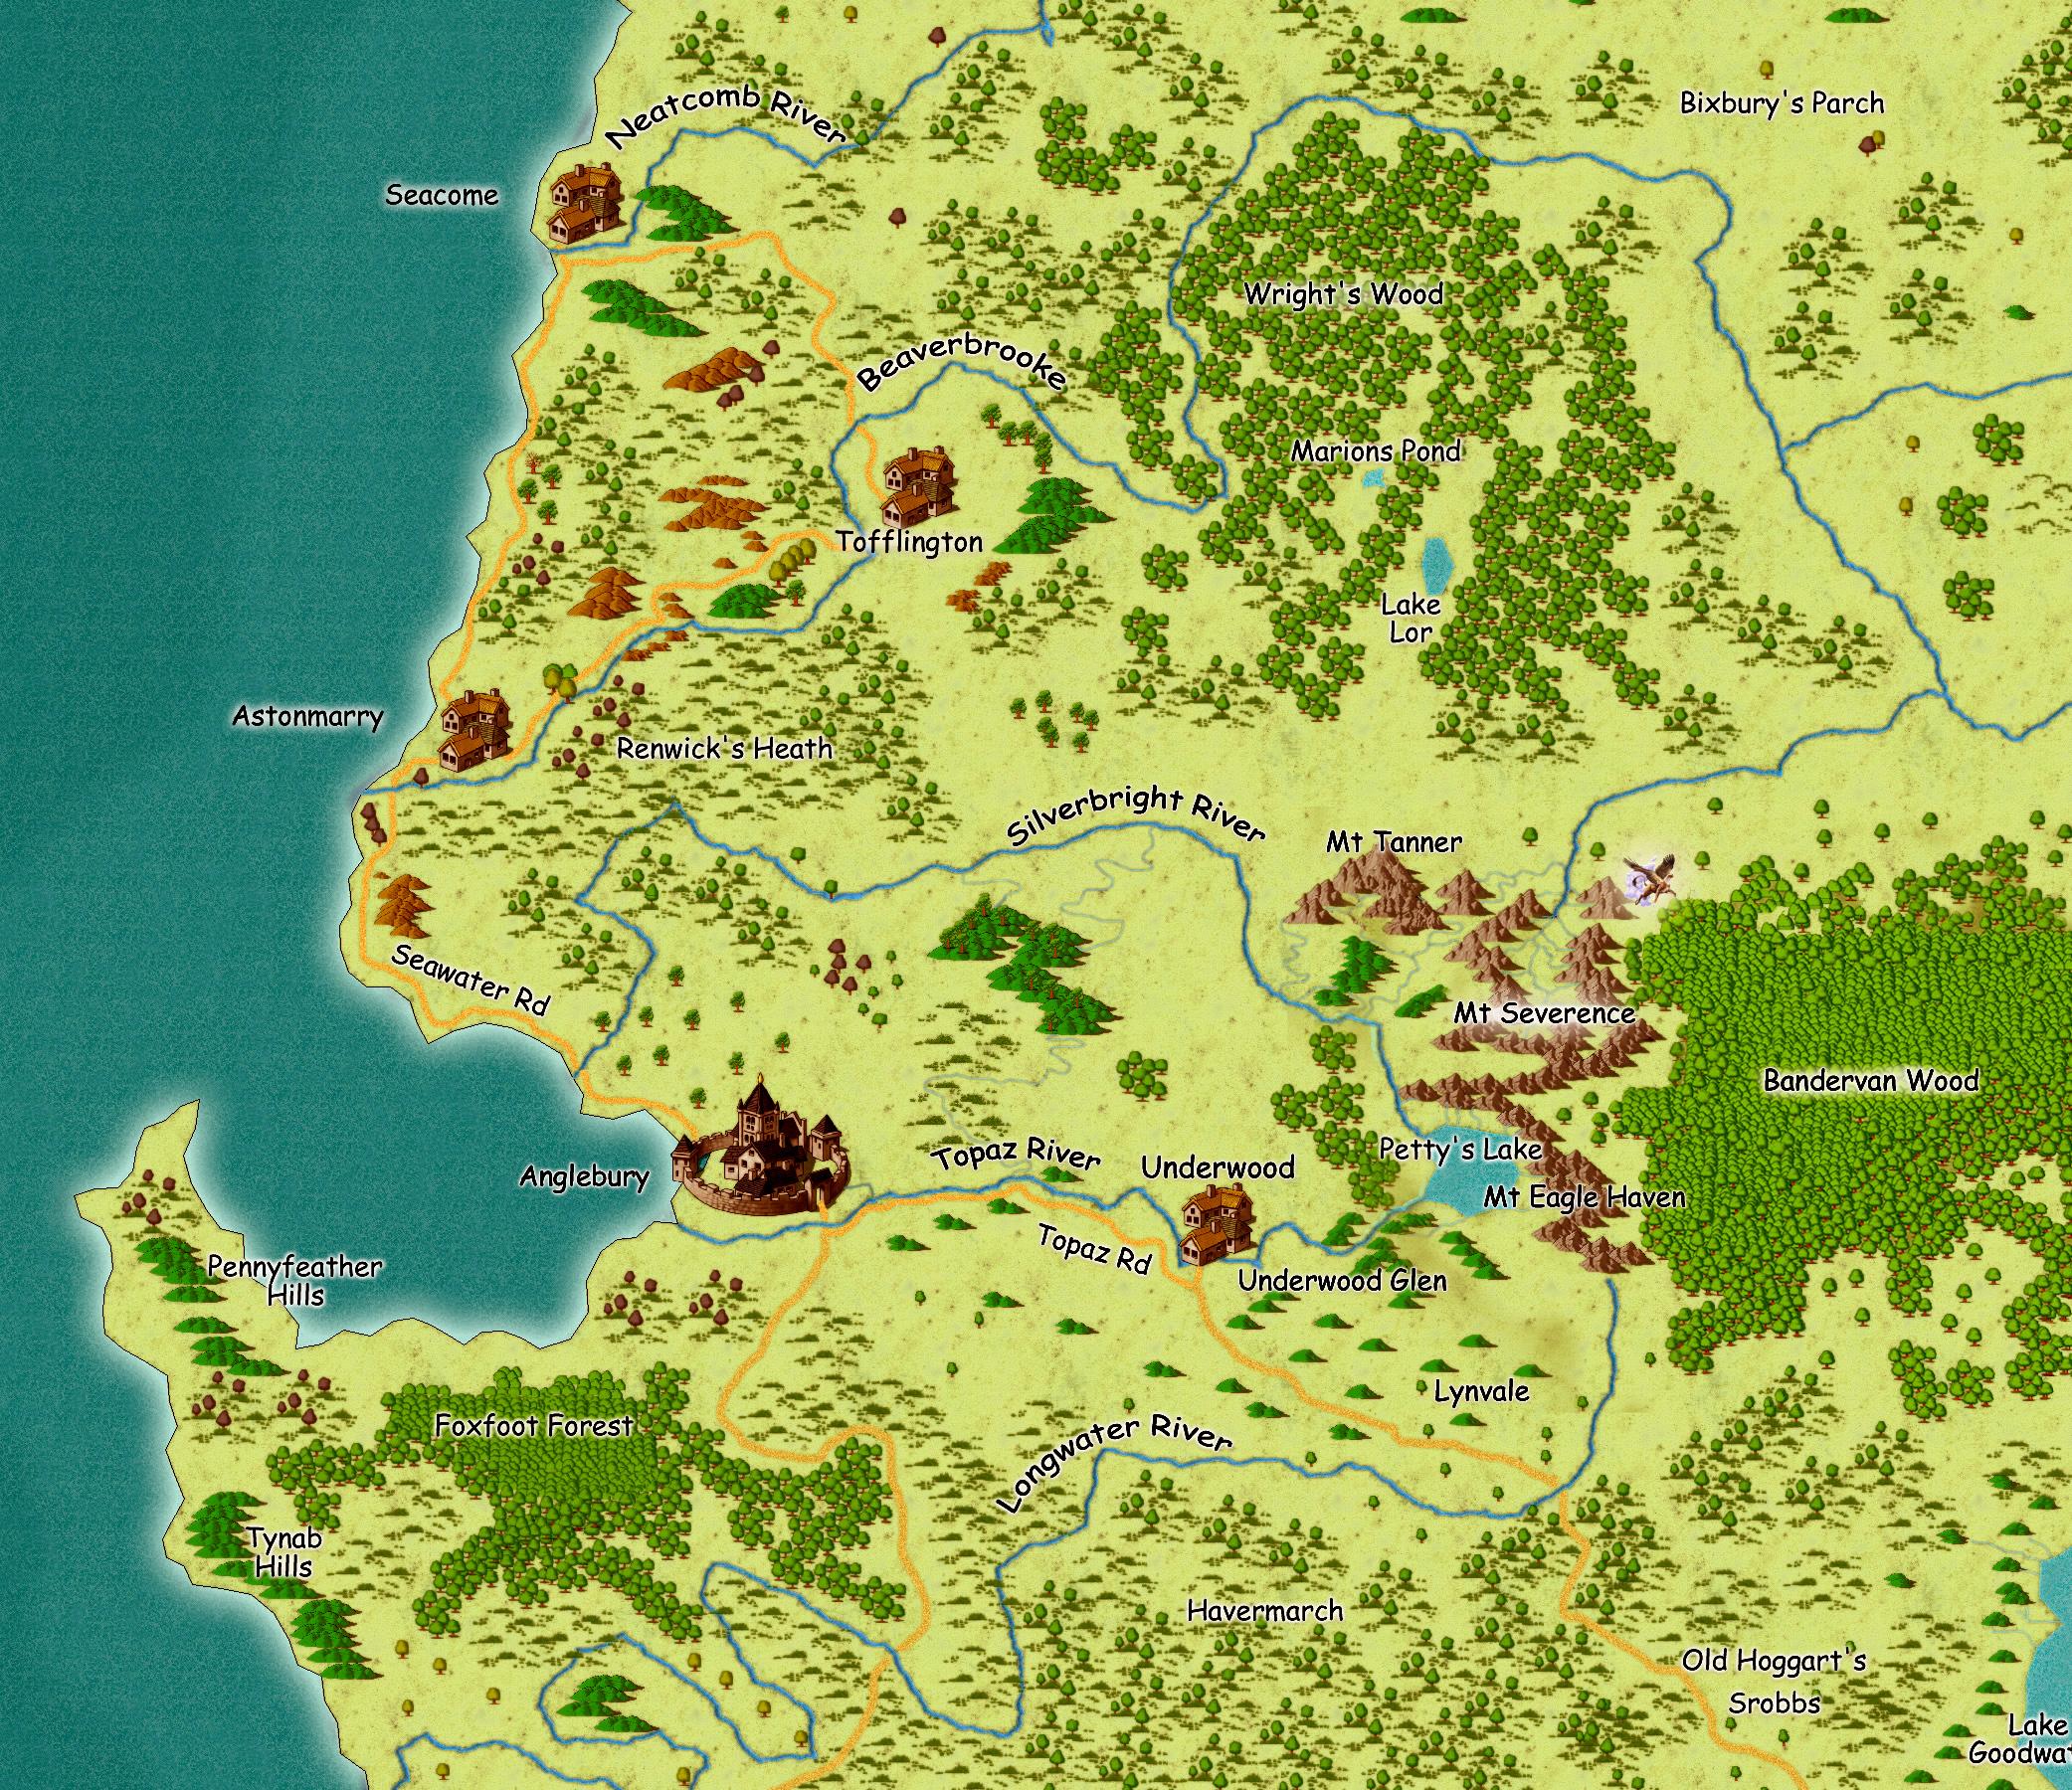 Anglebury Region B1